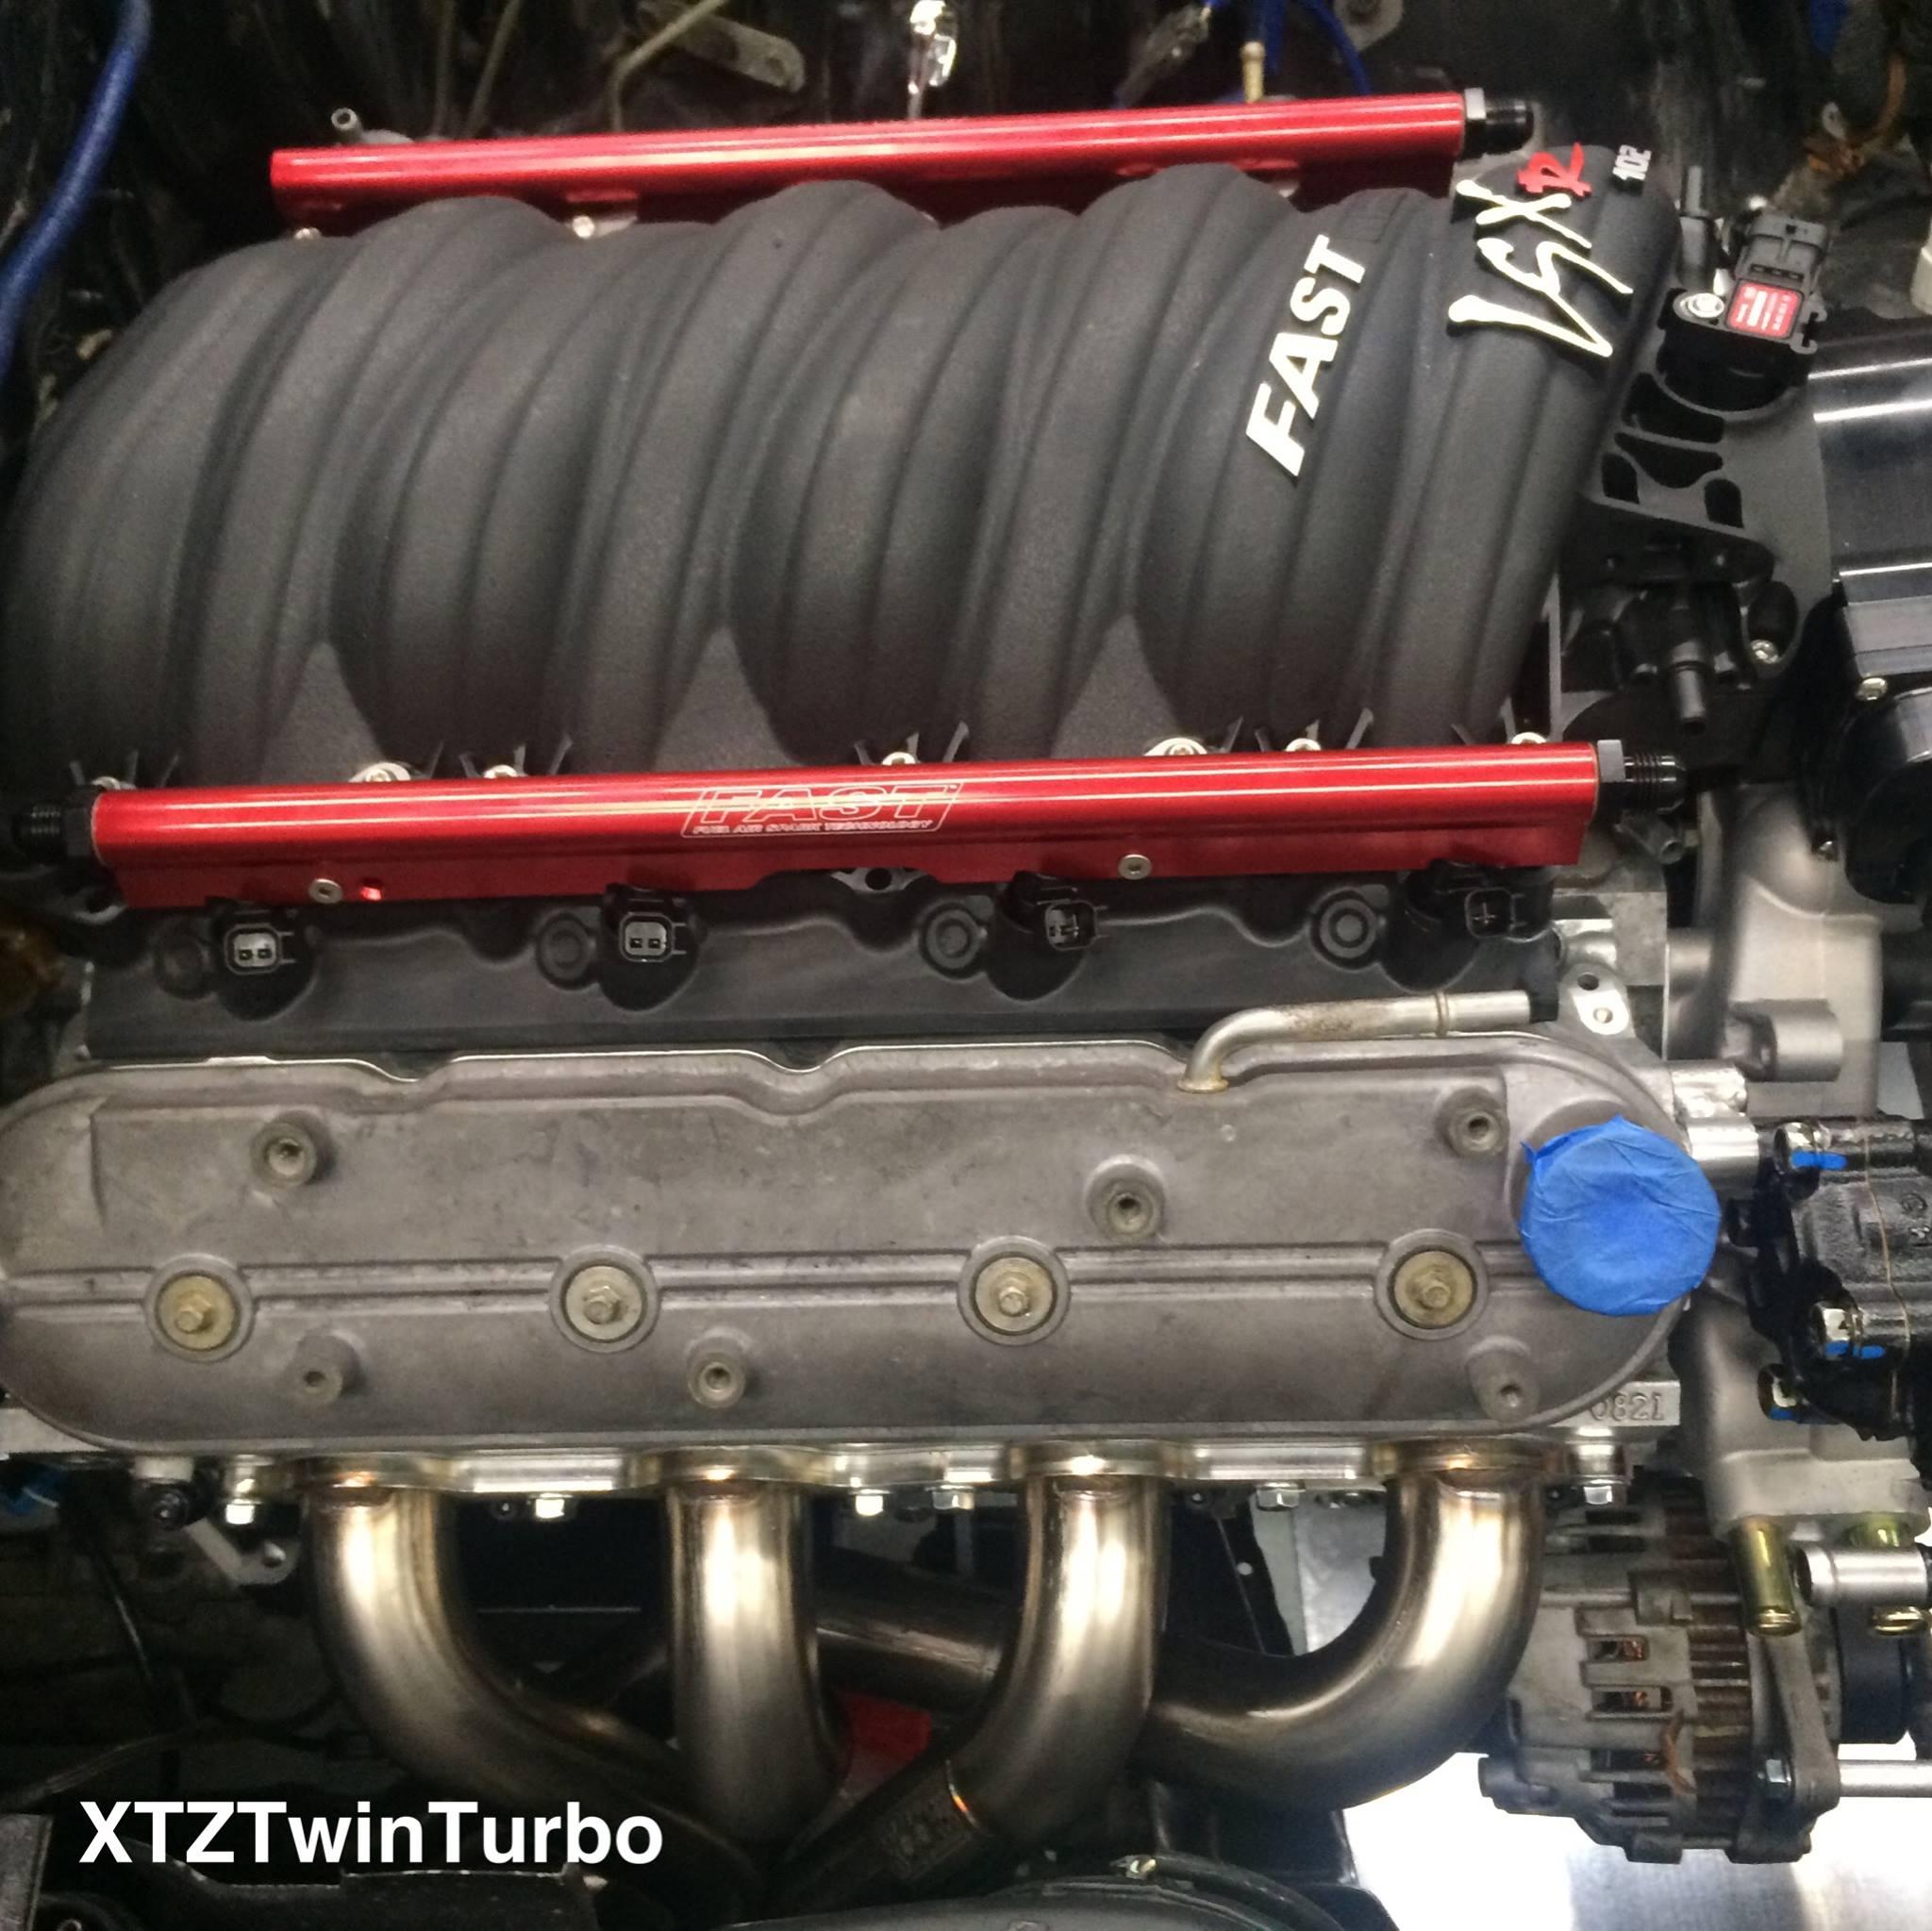 300zx Twin Turbo Motor: Nissan 300ZX With Twin-Turbo LS3